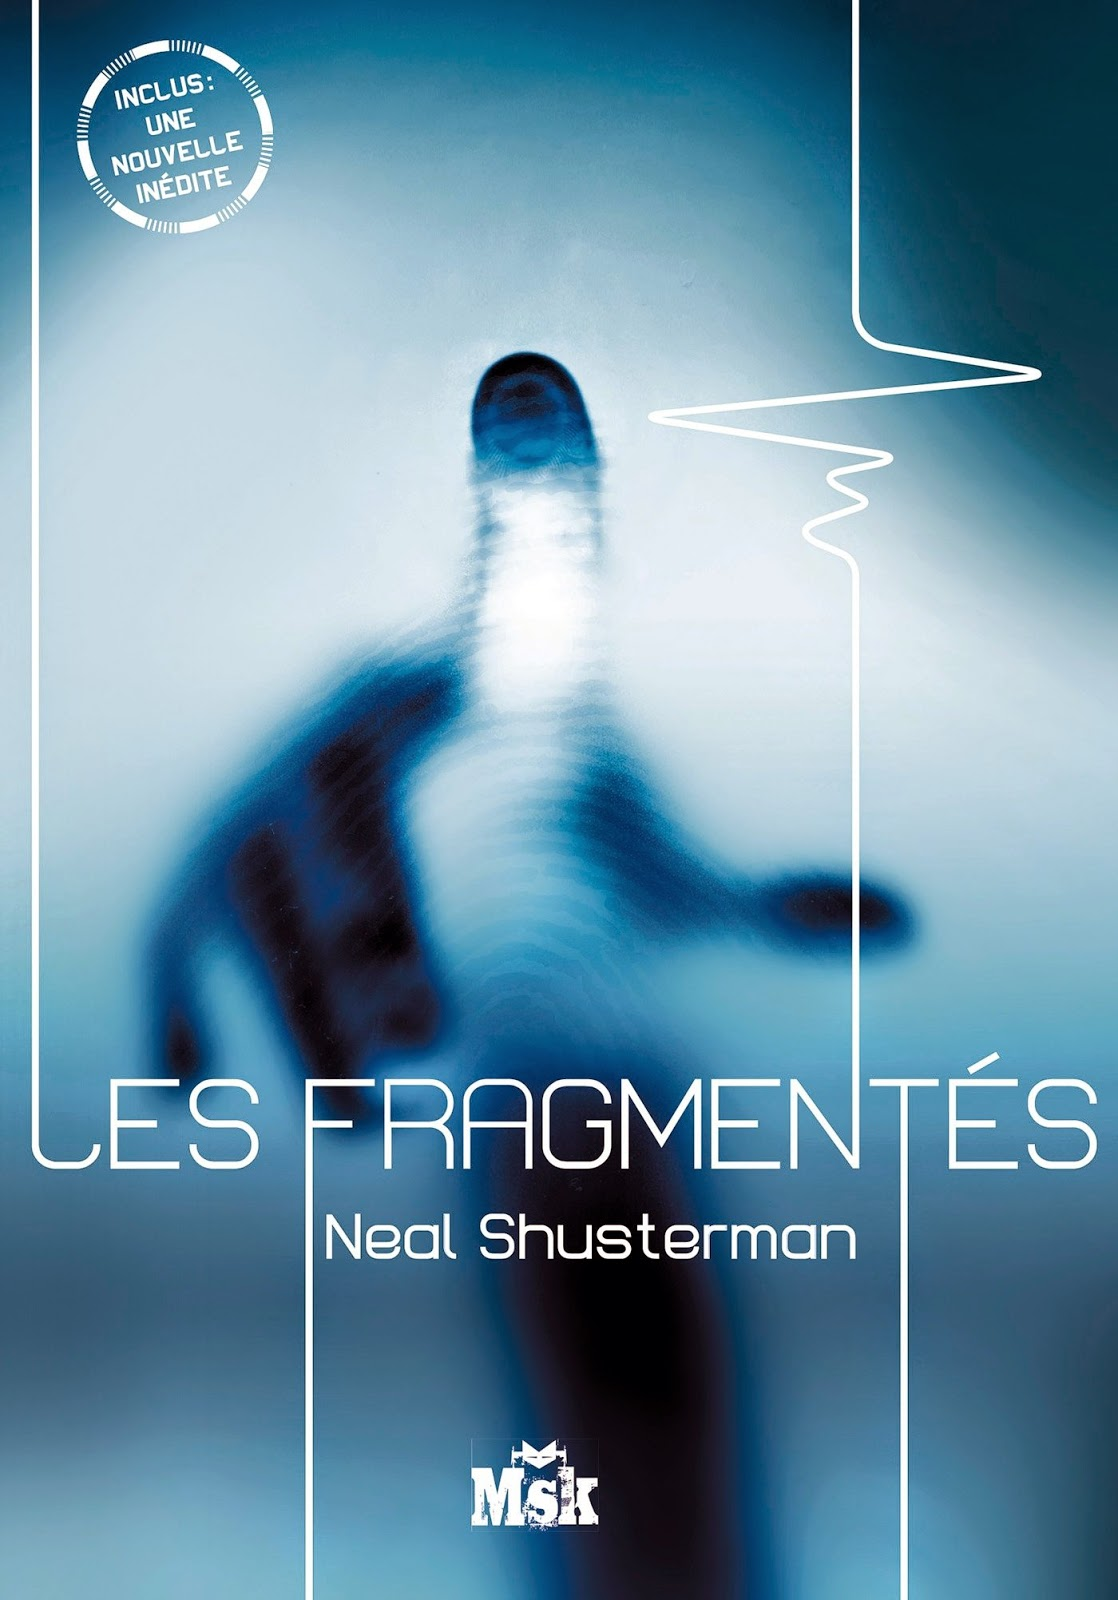 Les Fragmentés Unwind Neal Shusterman cover